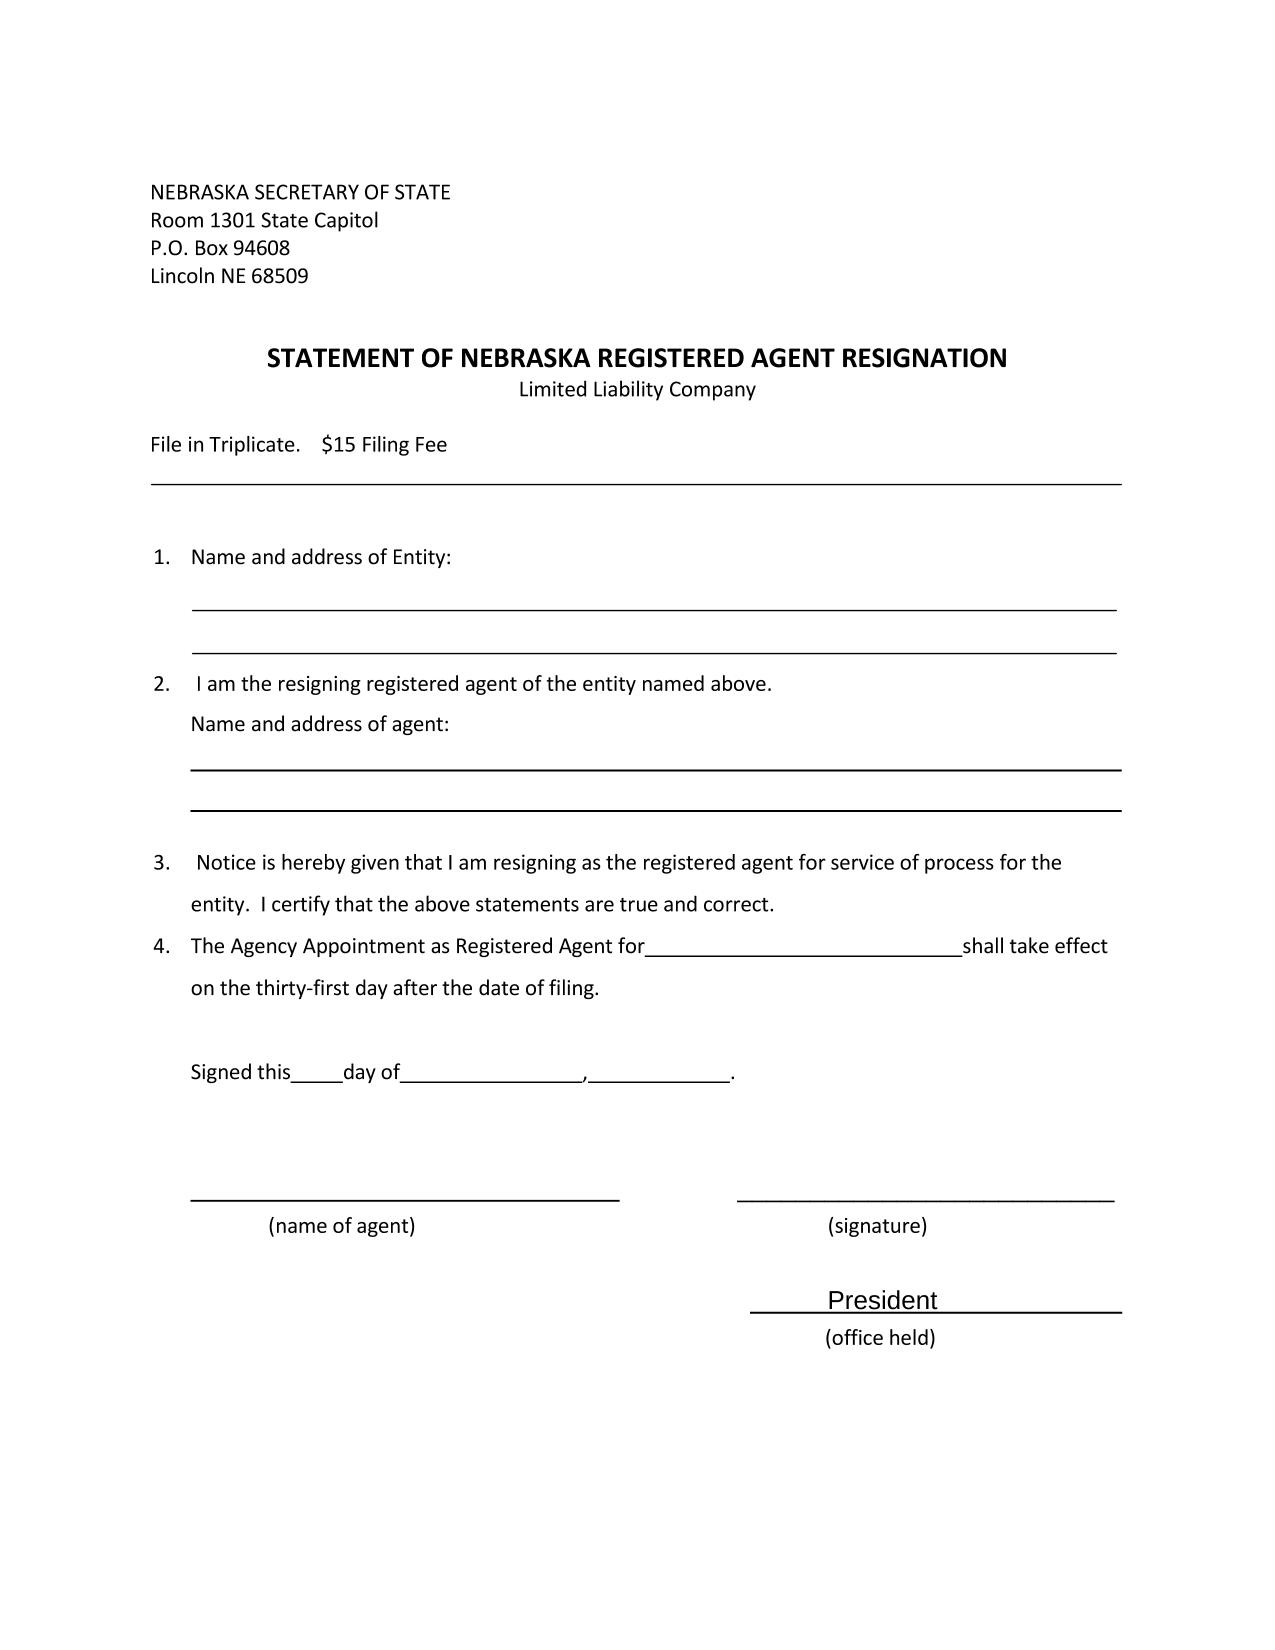 nebraska-llc-statement-of-resignation-of-registered-agent